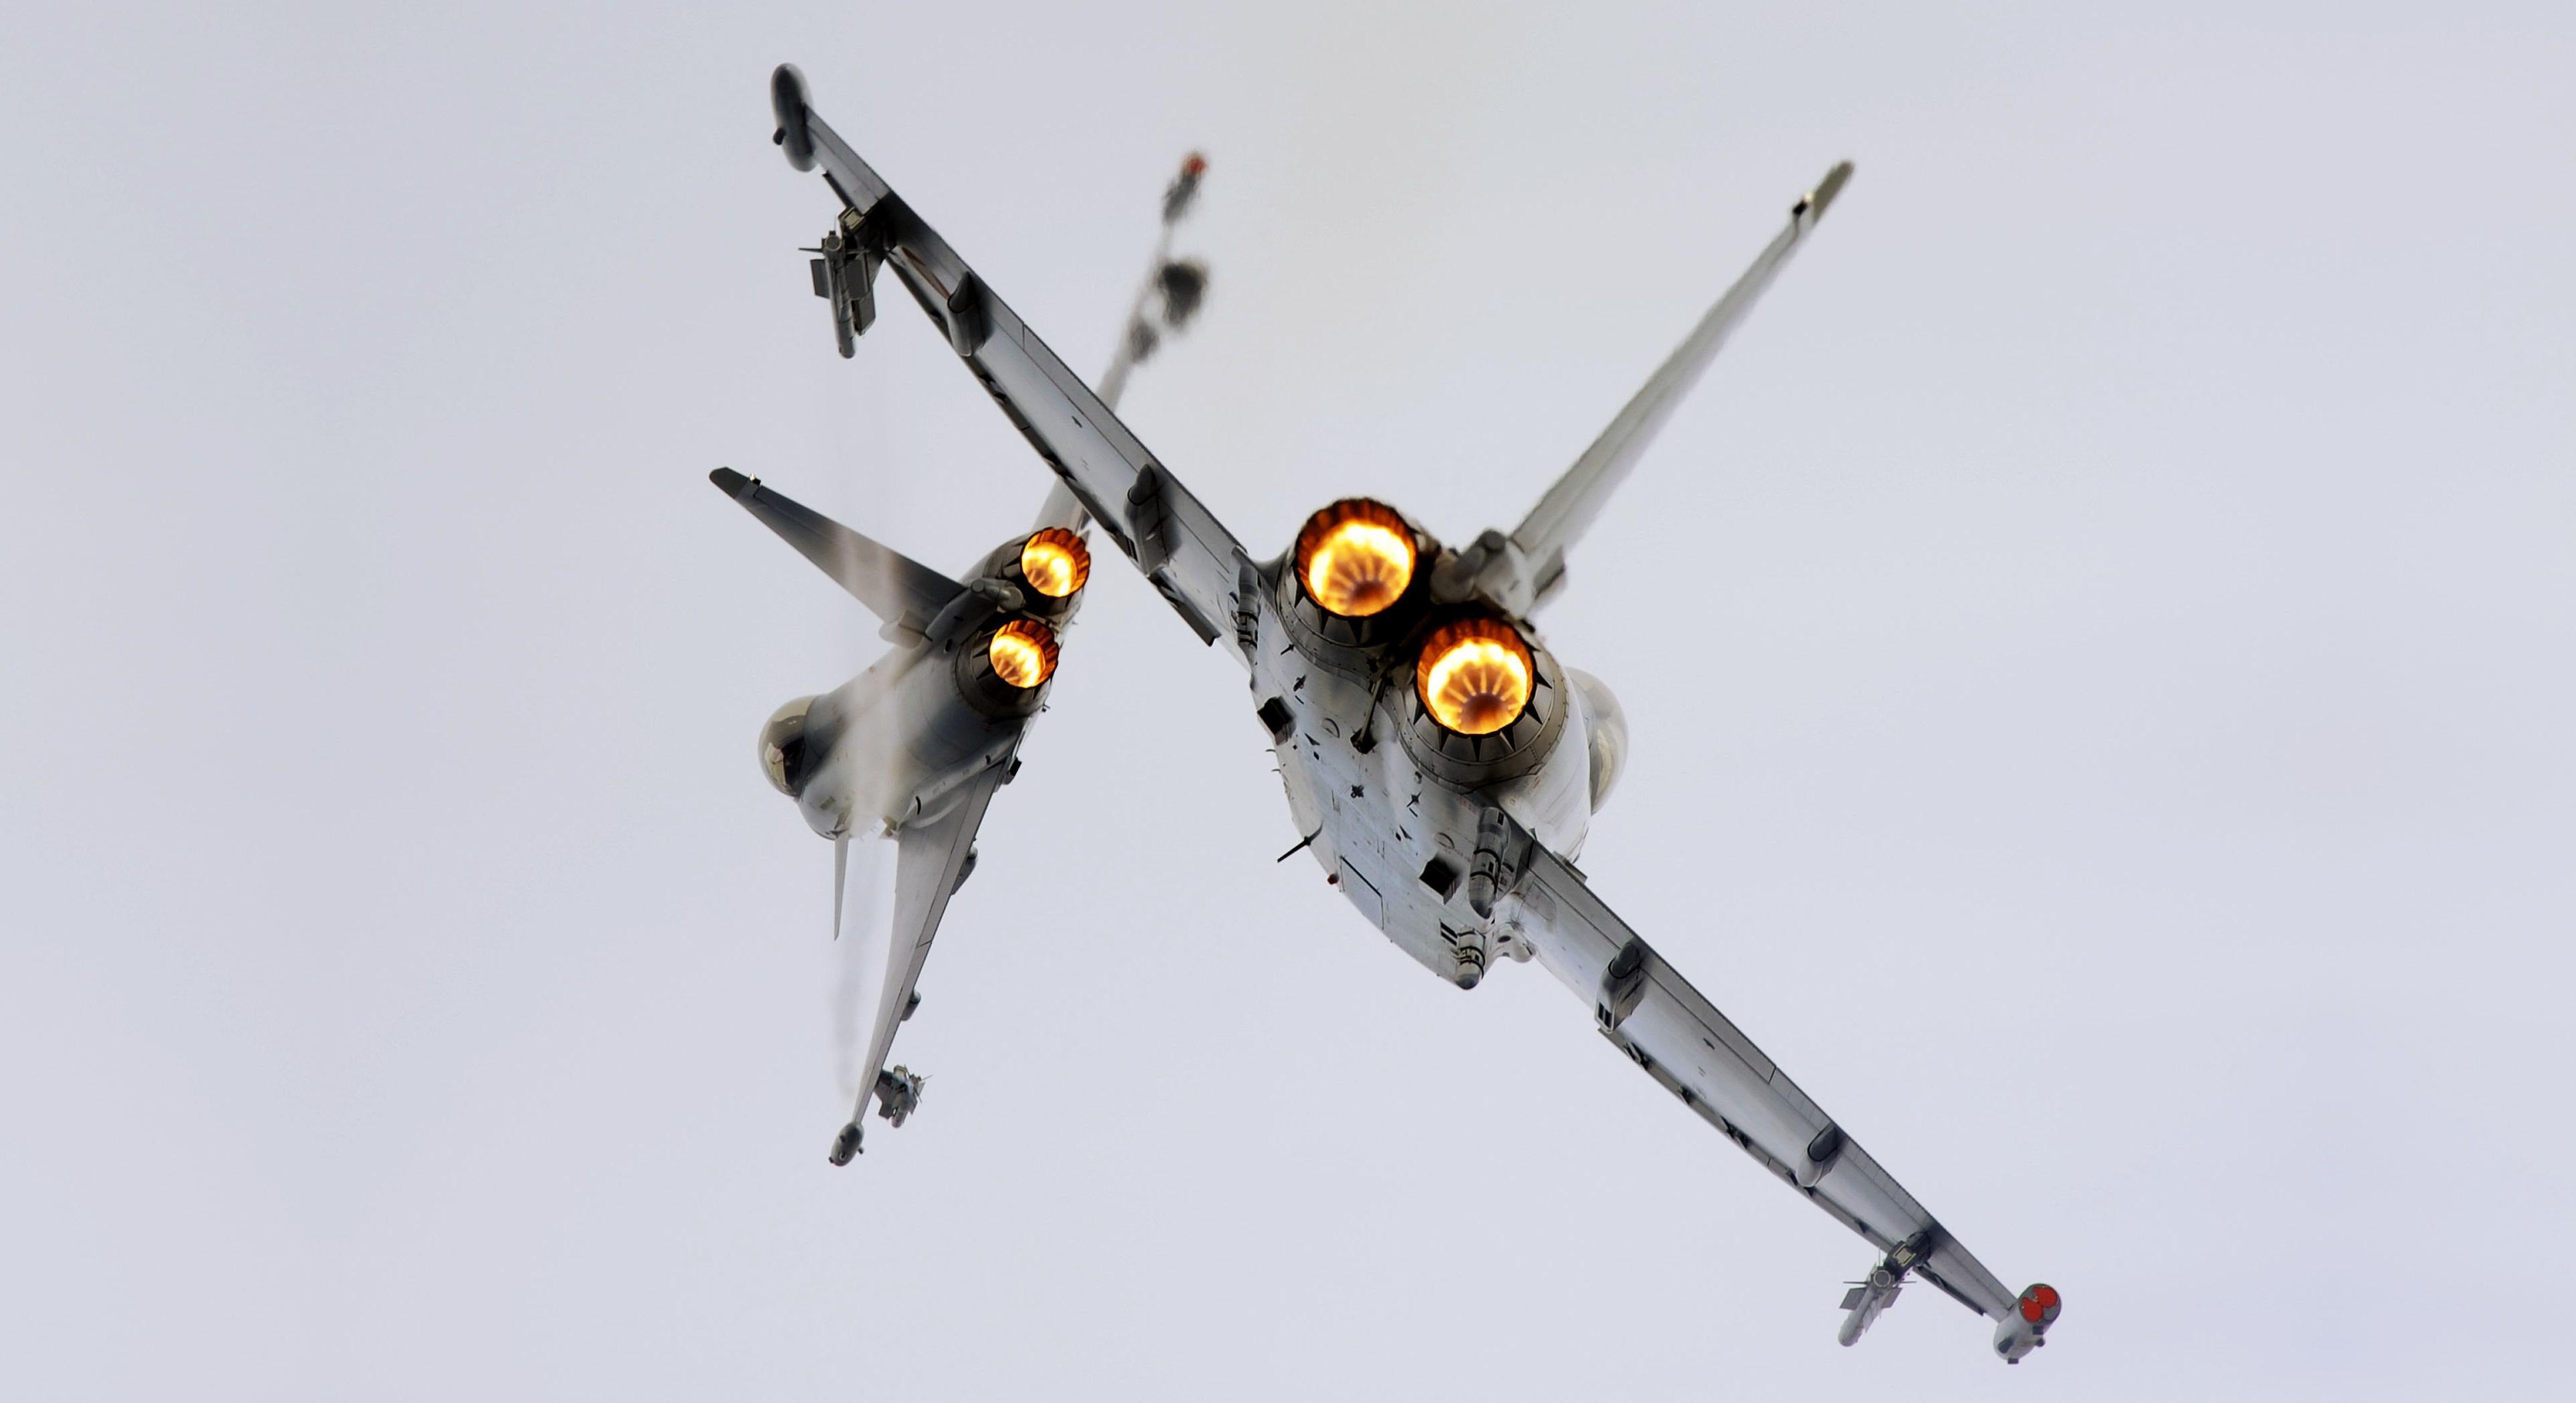 eurofighter typhoon wallpaper hd download